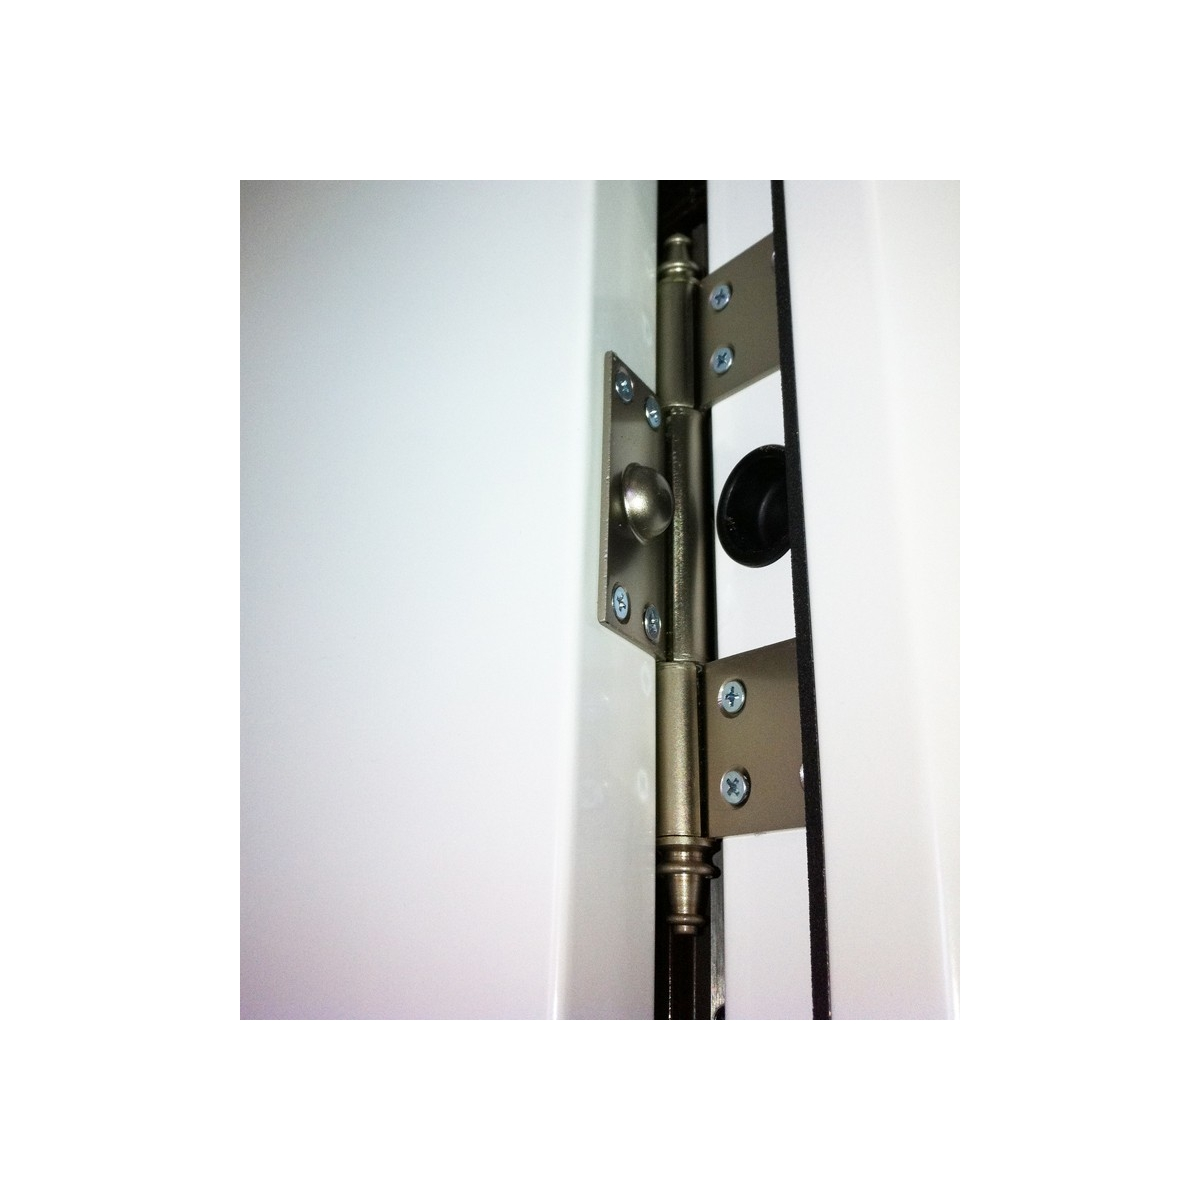 Puerta acorazada Lisa Puertas acorazadas Serie B4-BL Cearco